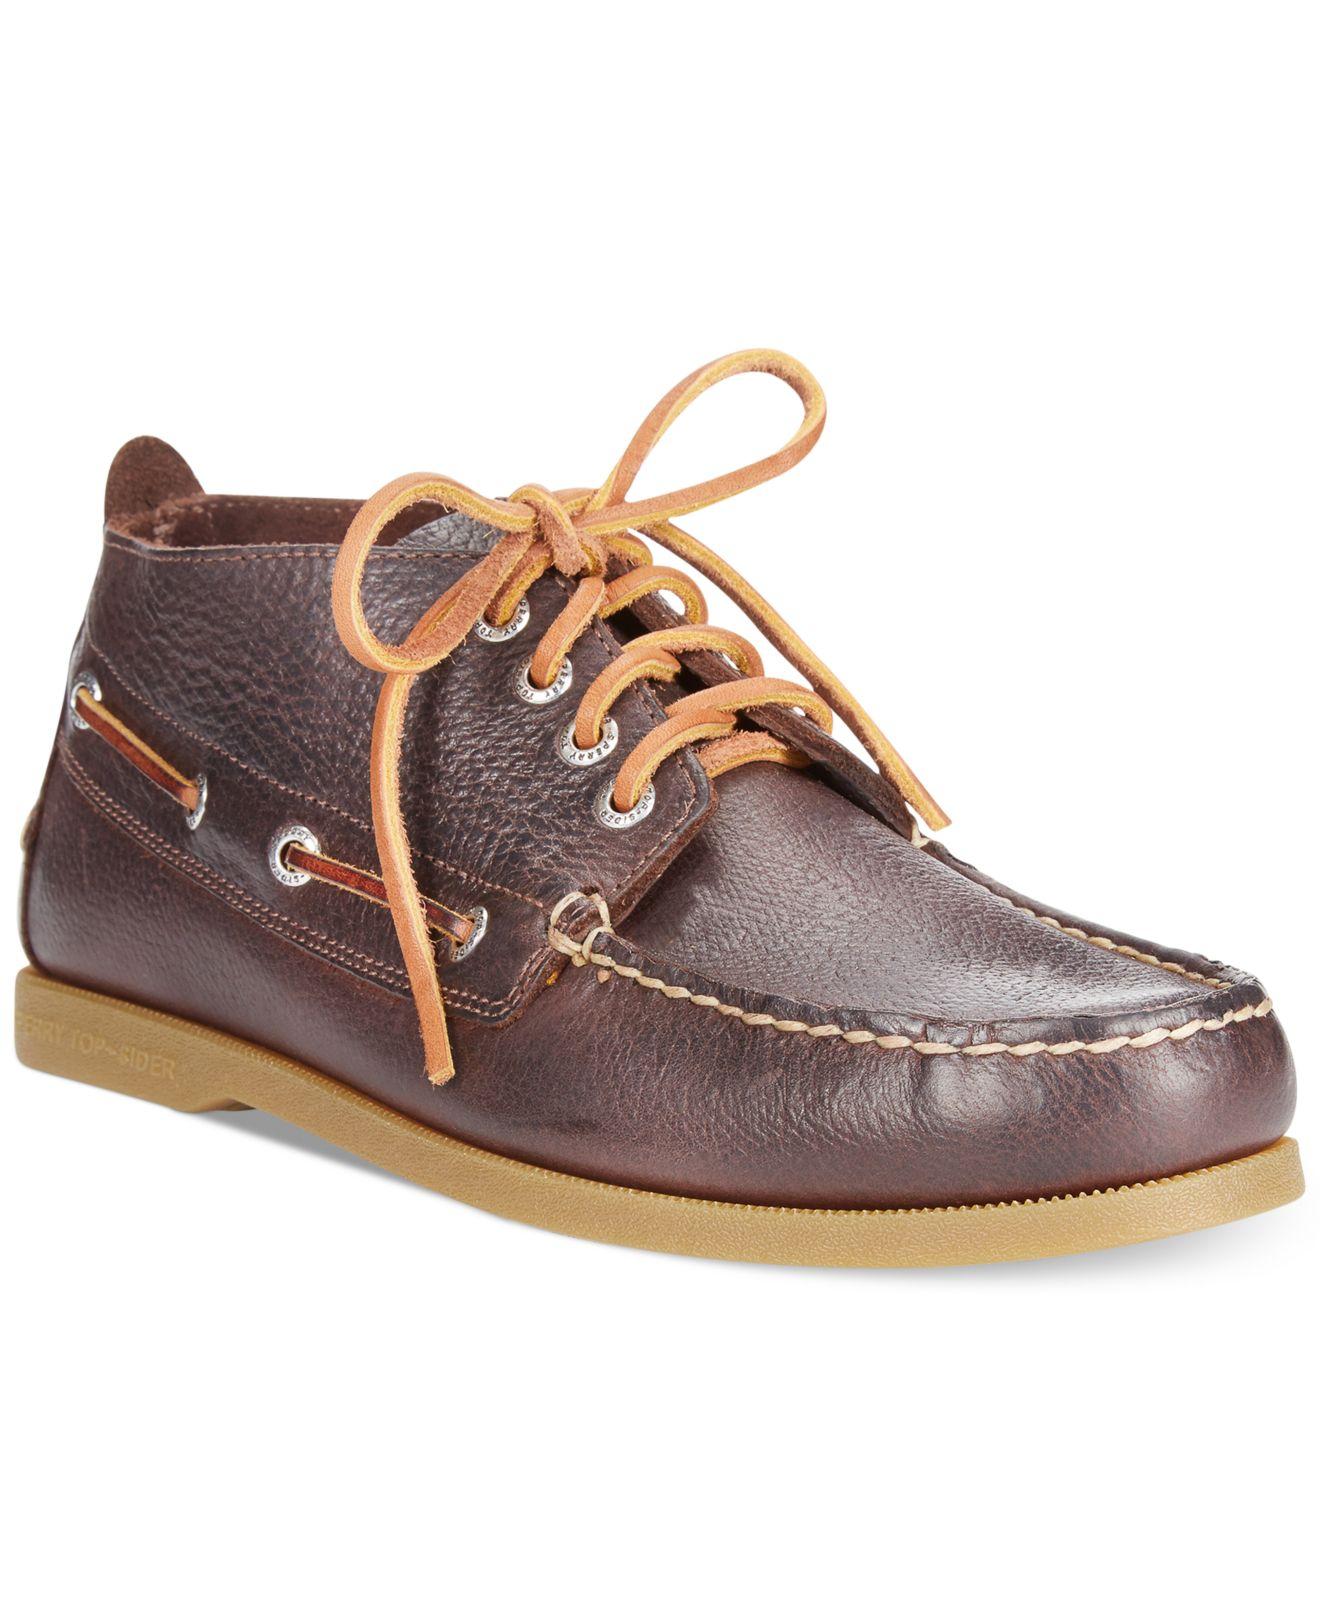 Awesome Sperry Menu00b4s Commander Chukka Boots | Dillards